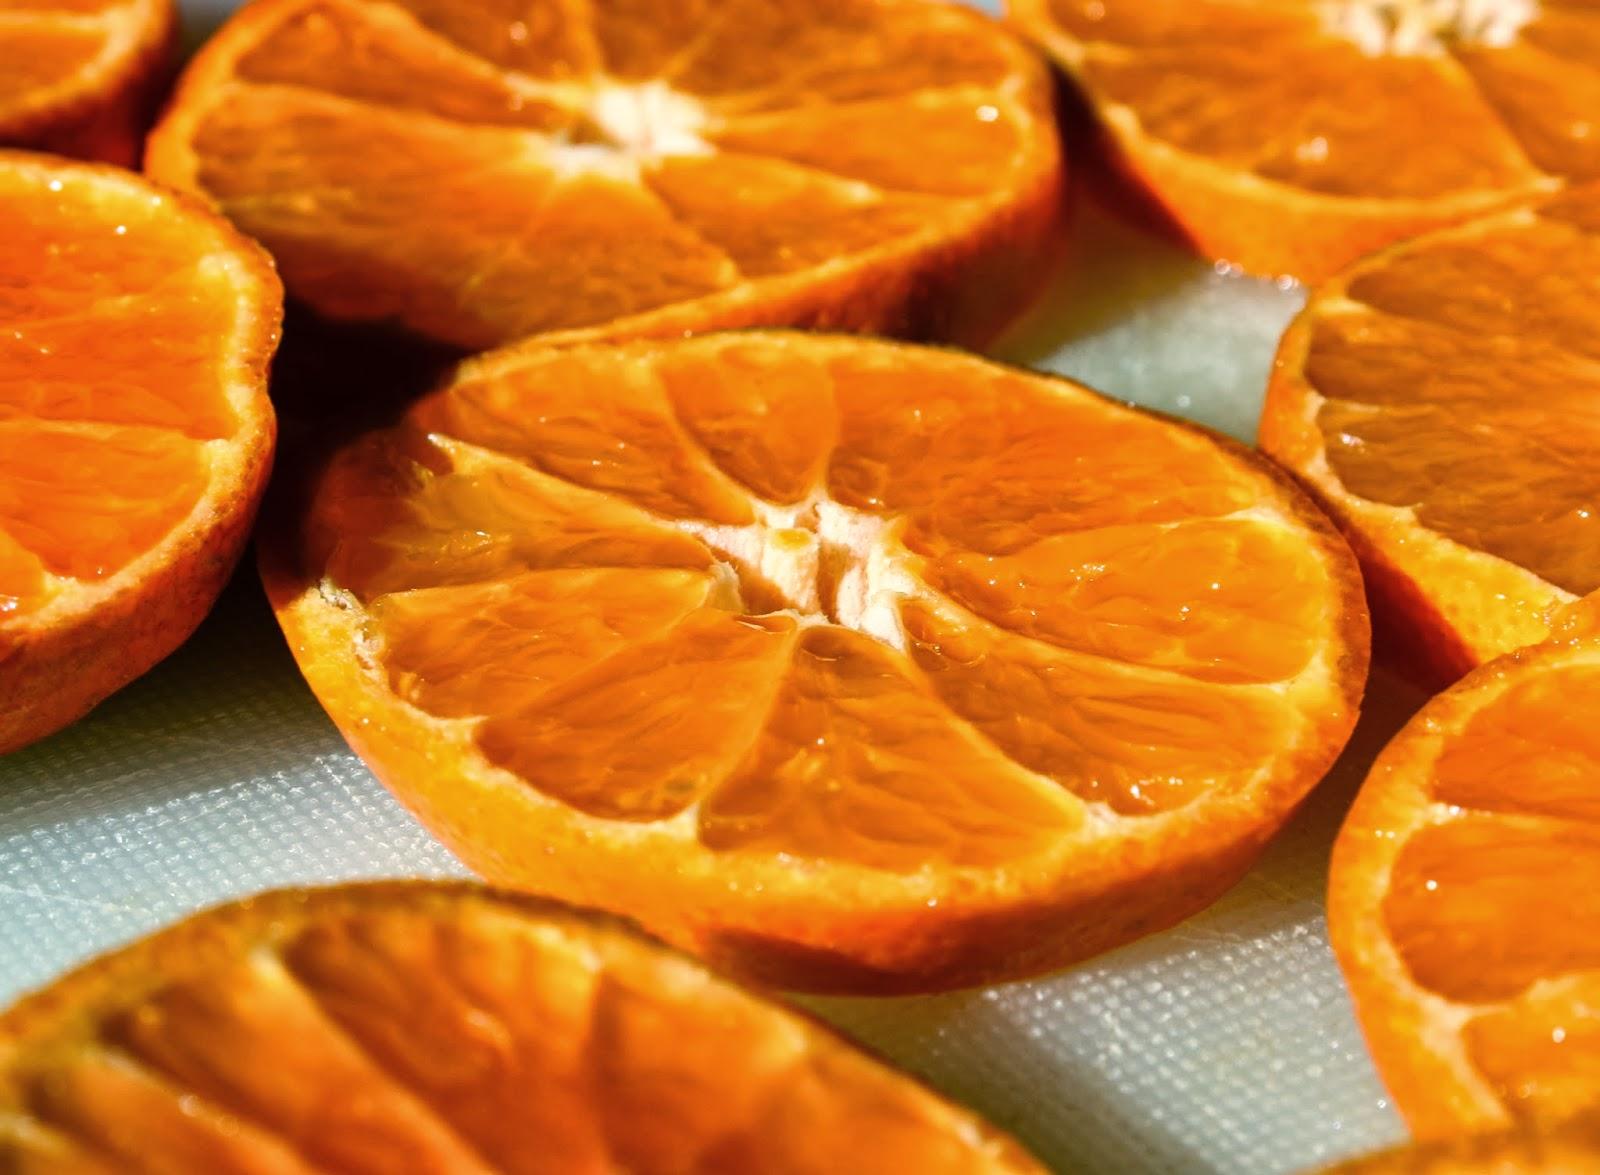 orangenschalen im backofen trocknen